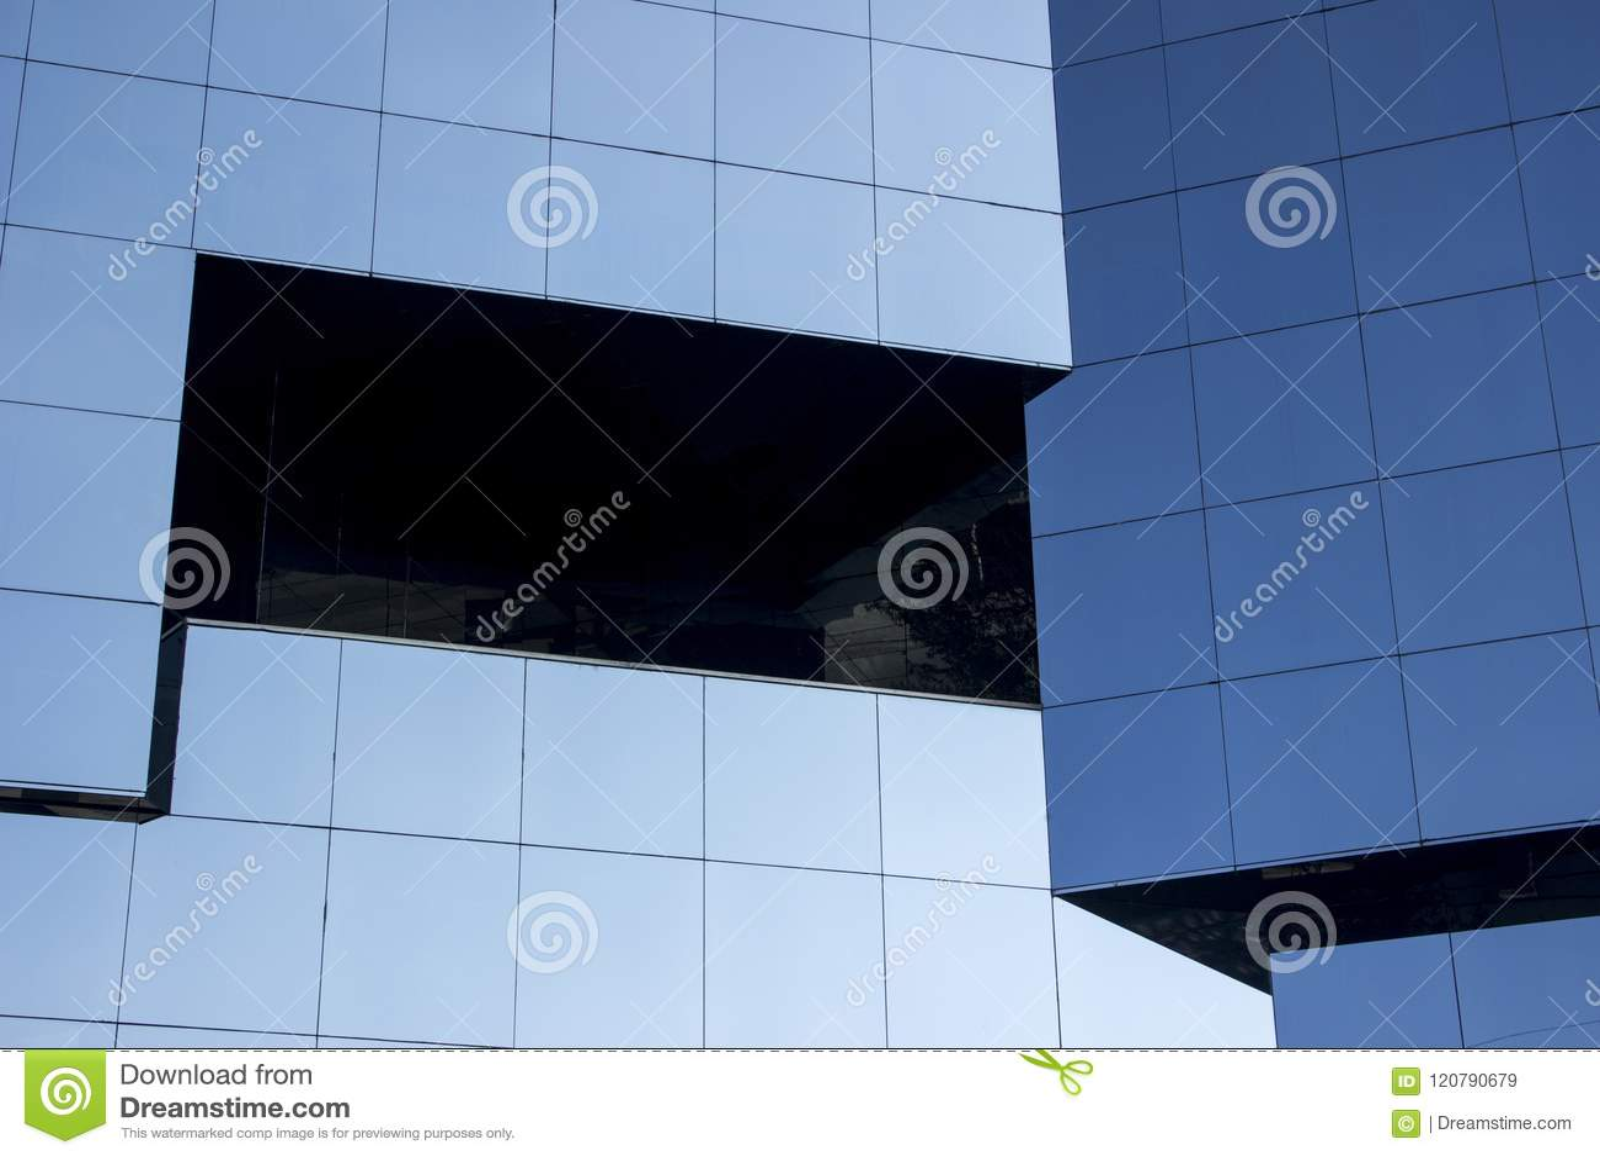 Tiro cercano de un façade moderno liso de la pared de la ventana de cristal